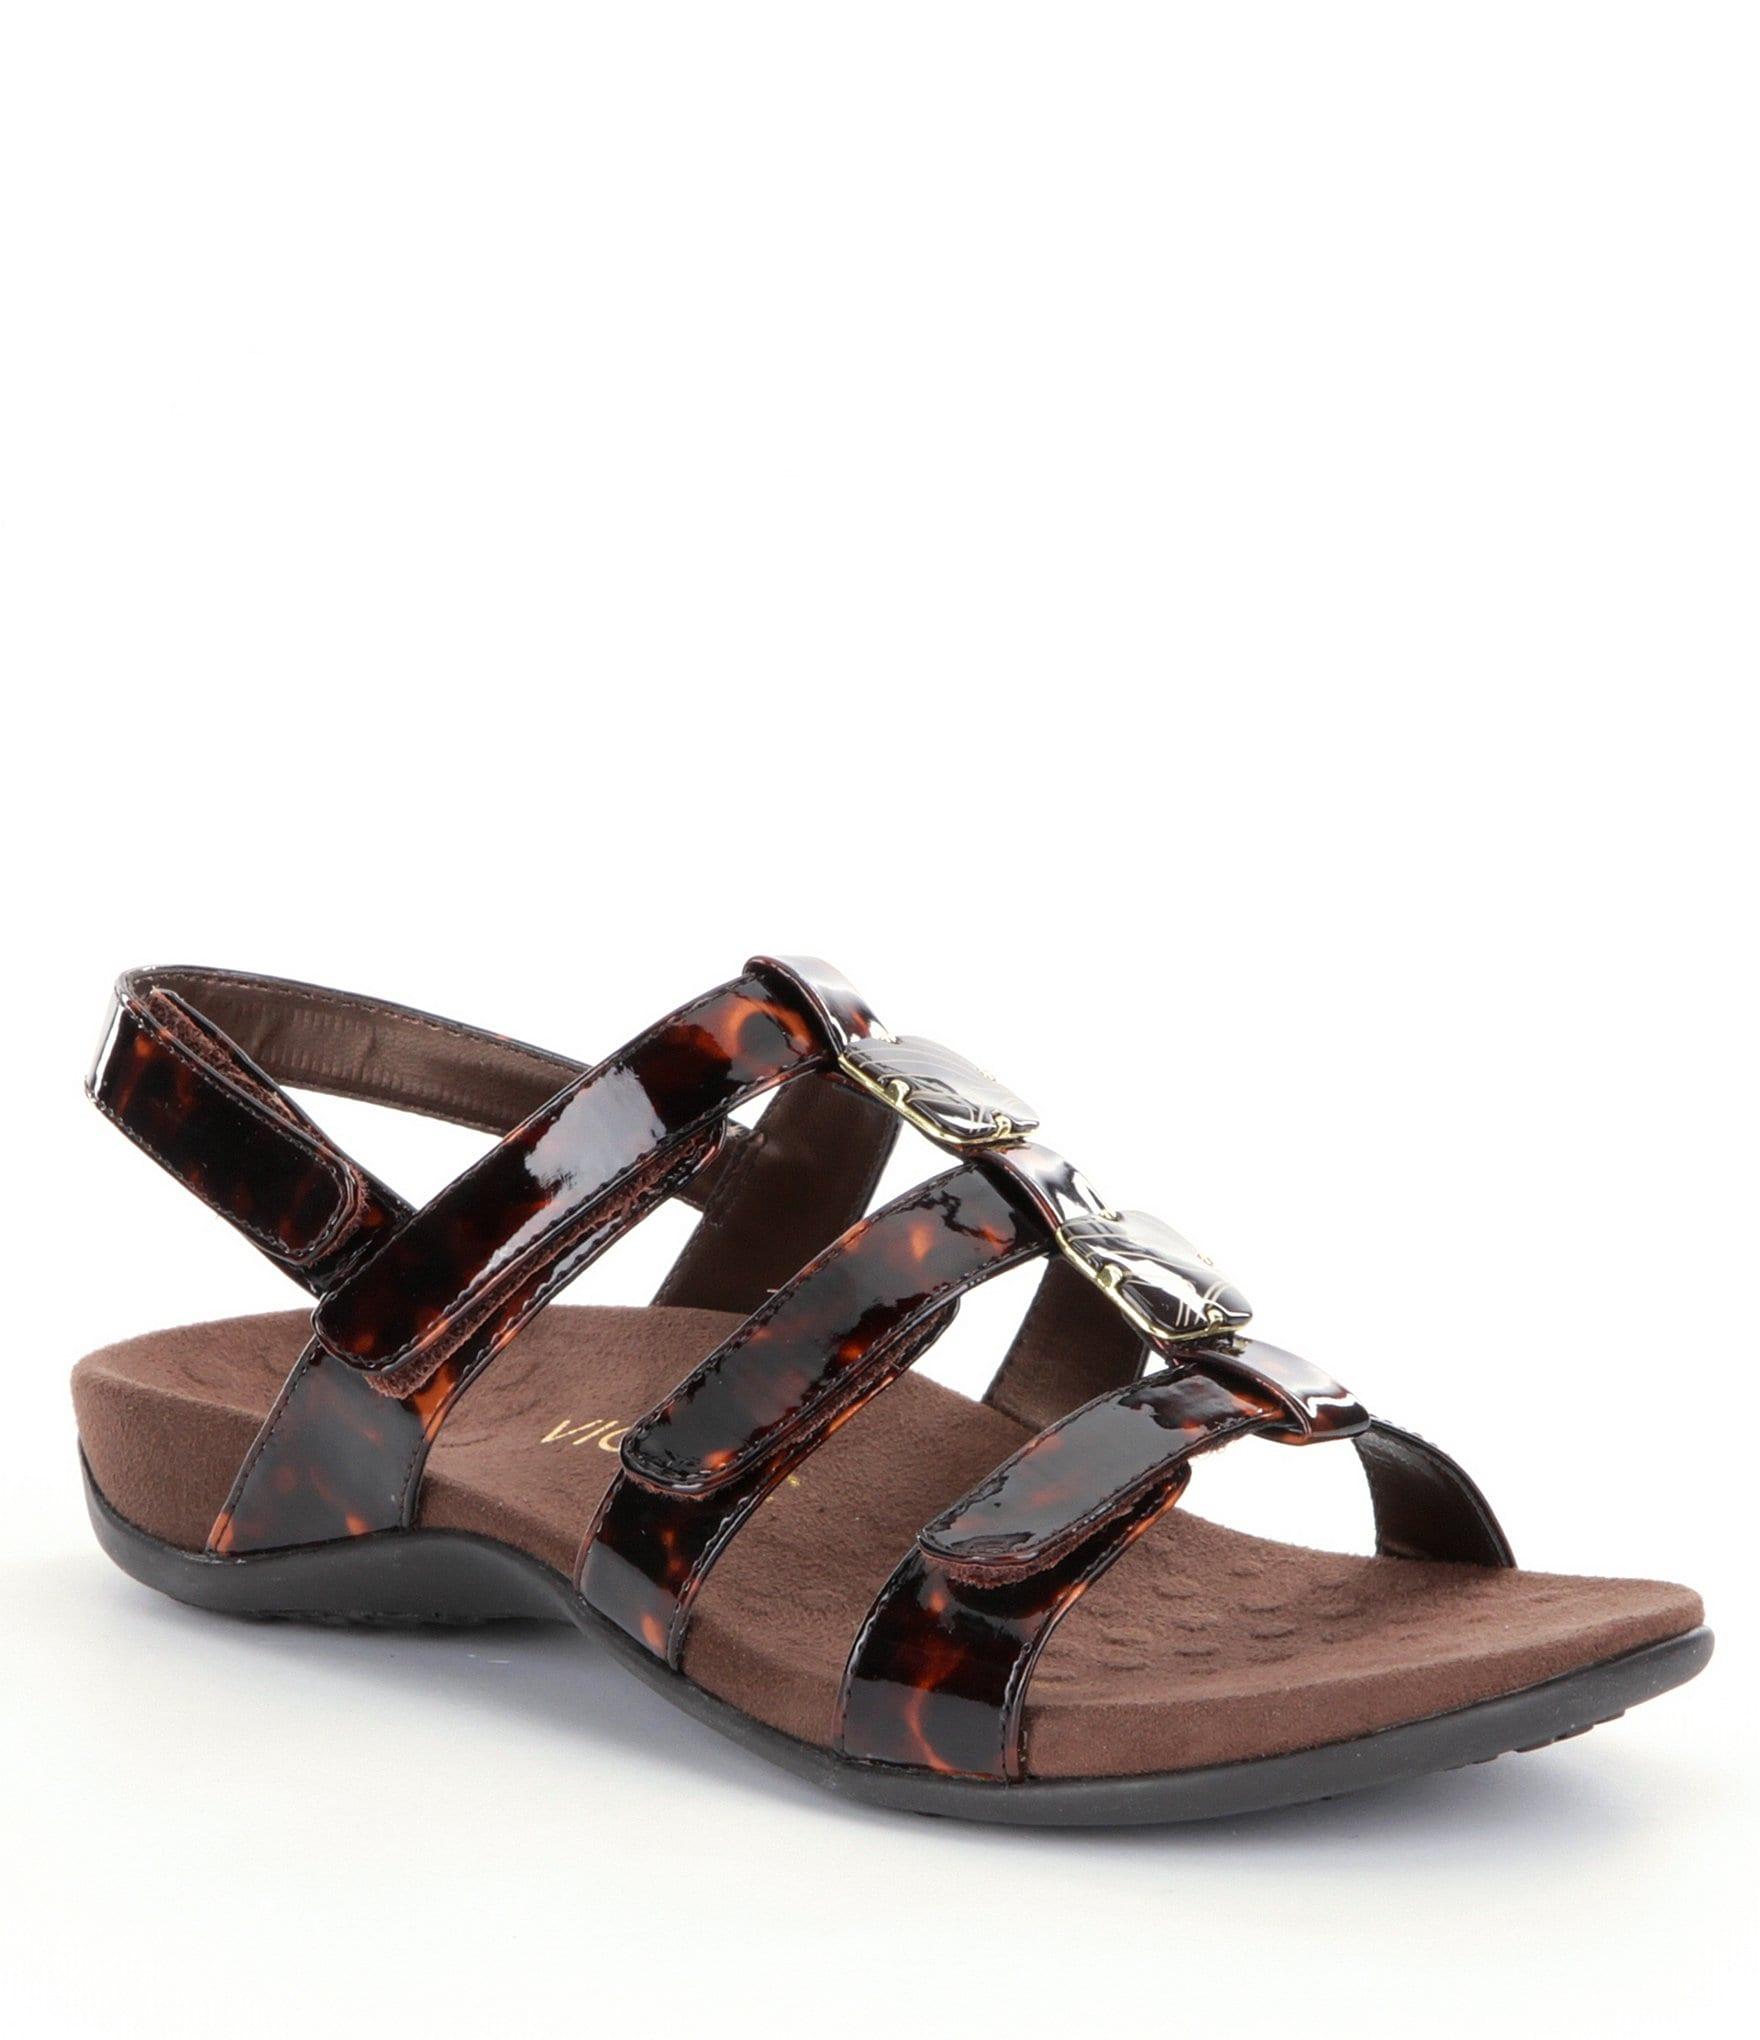 Womens sandals walmart - Womens Sandals Walmart 53